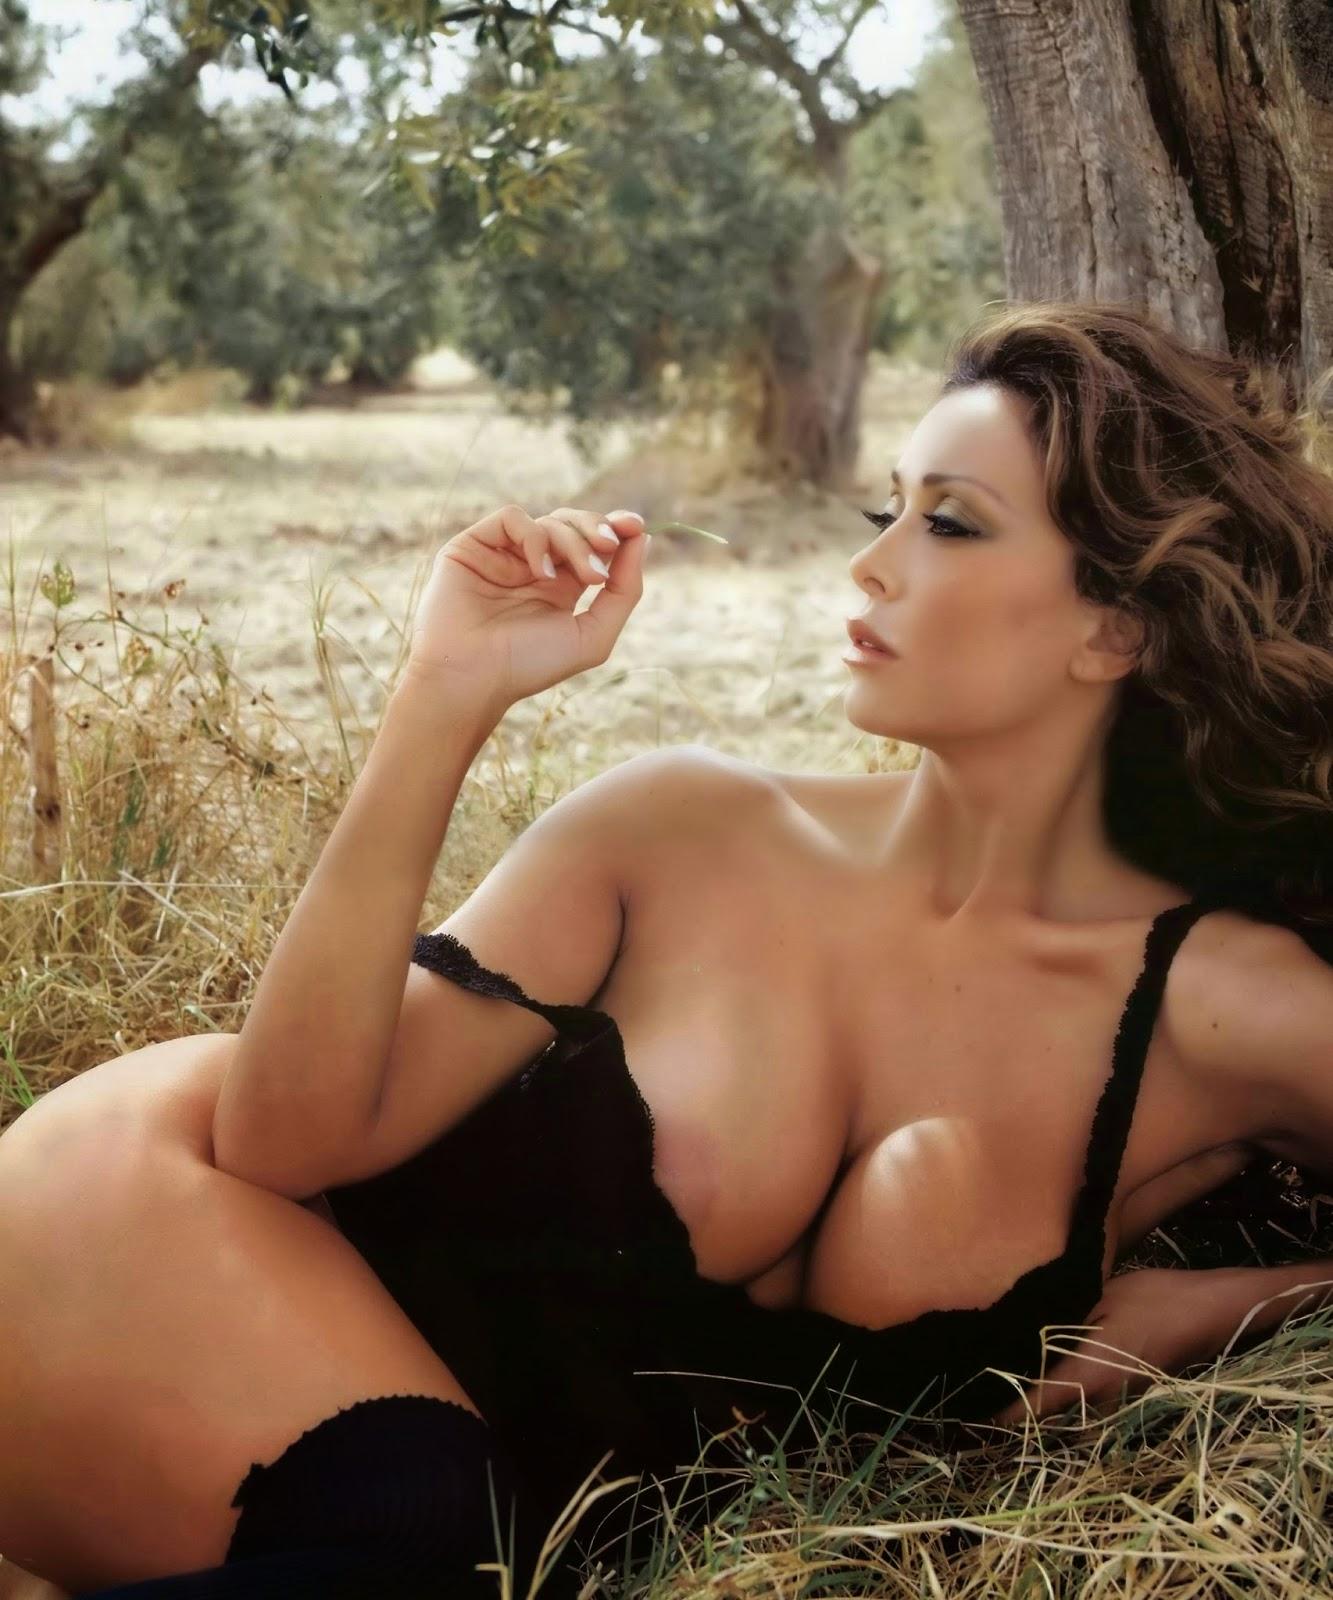 Sara Varone A Modern Italian Milf Or Italys Number One Goddess